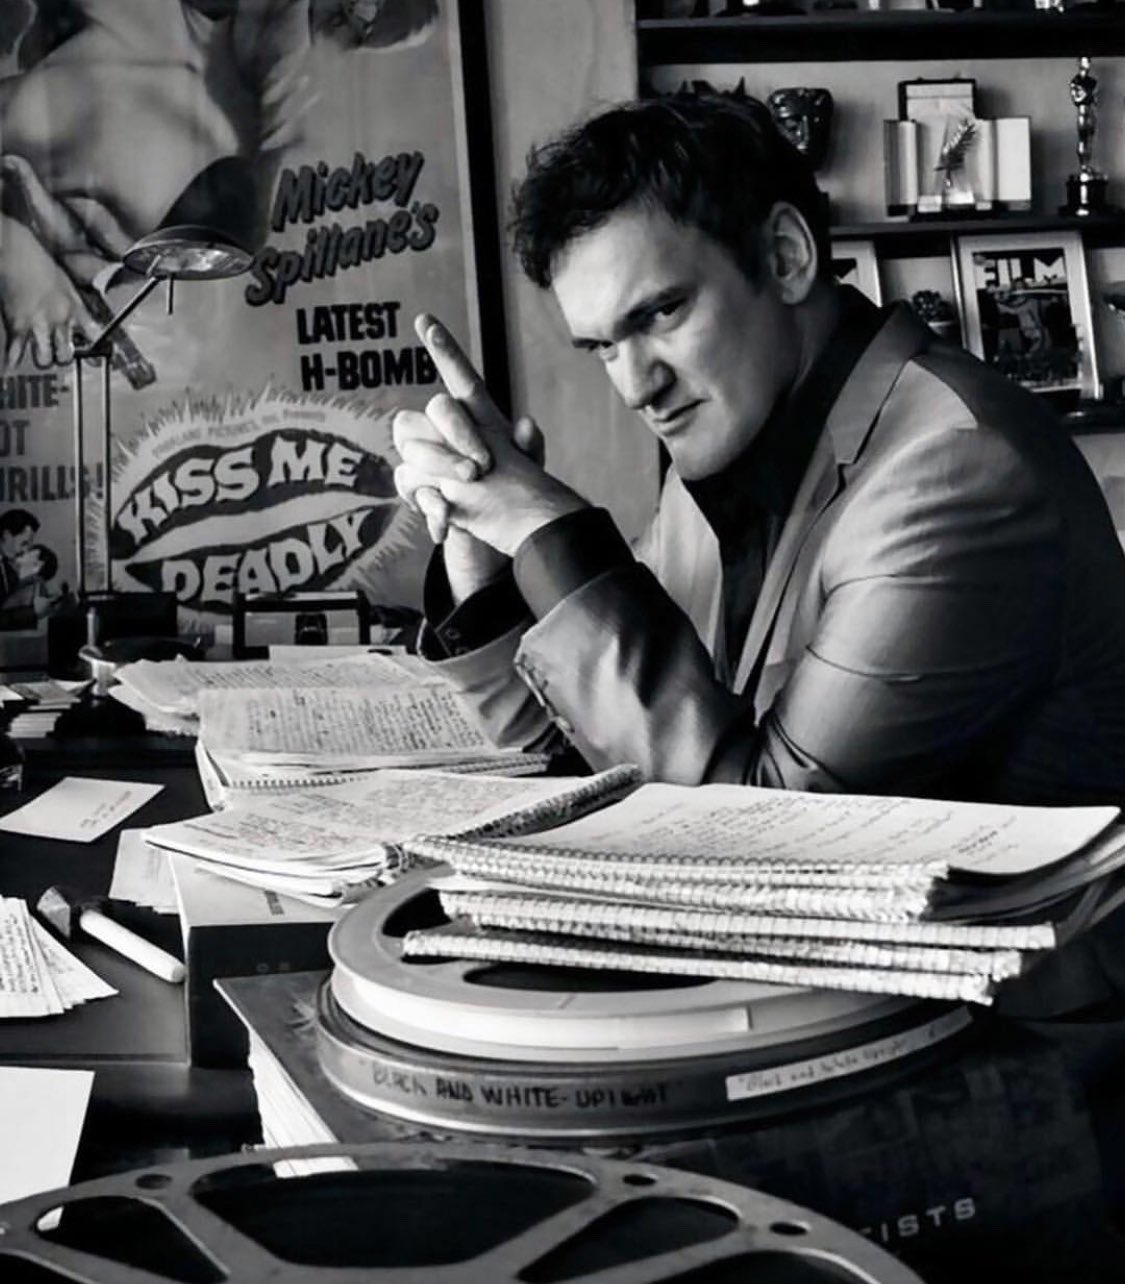 Happy Birthday to the legendary Quentin Tarantino. What s your favorite Tarantino film?